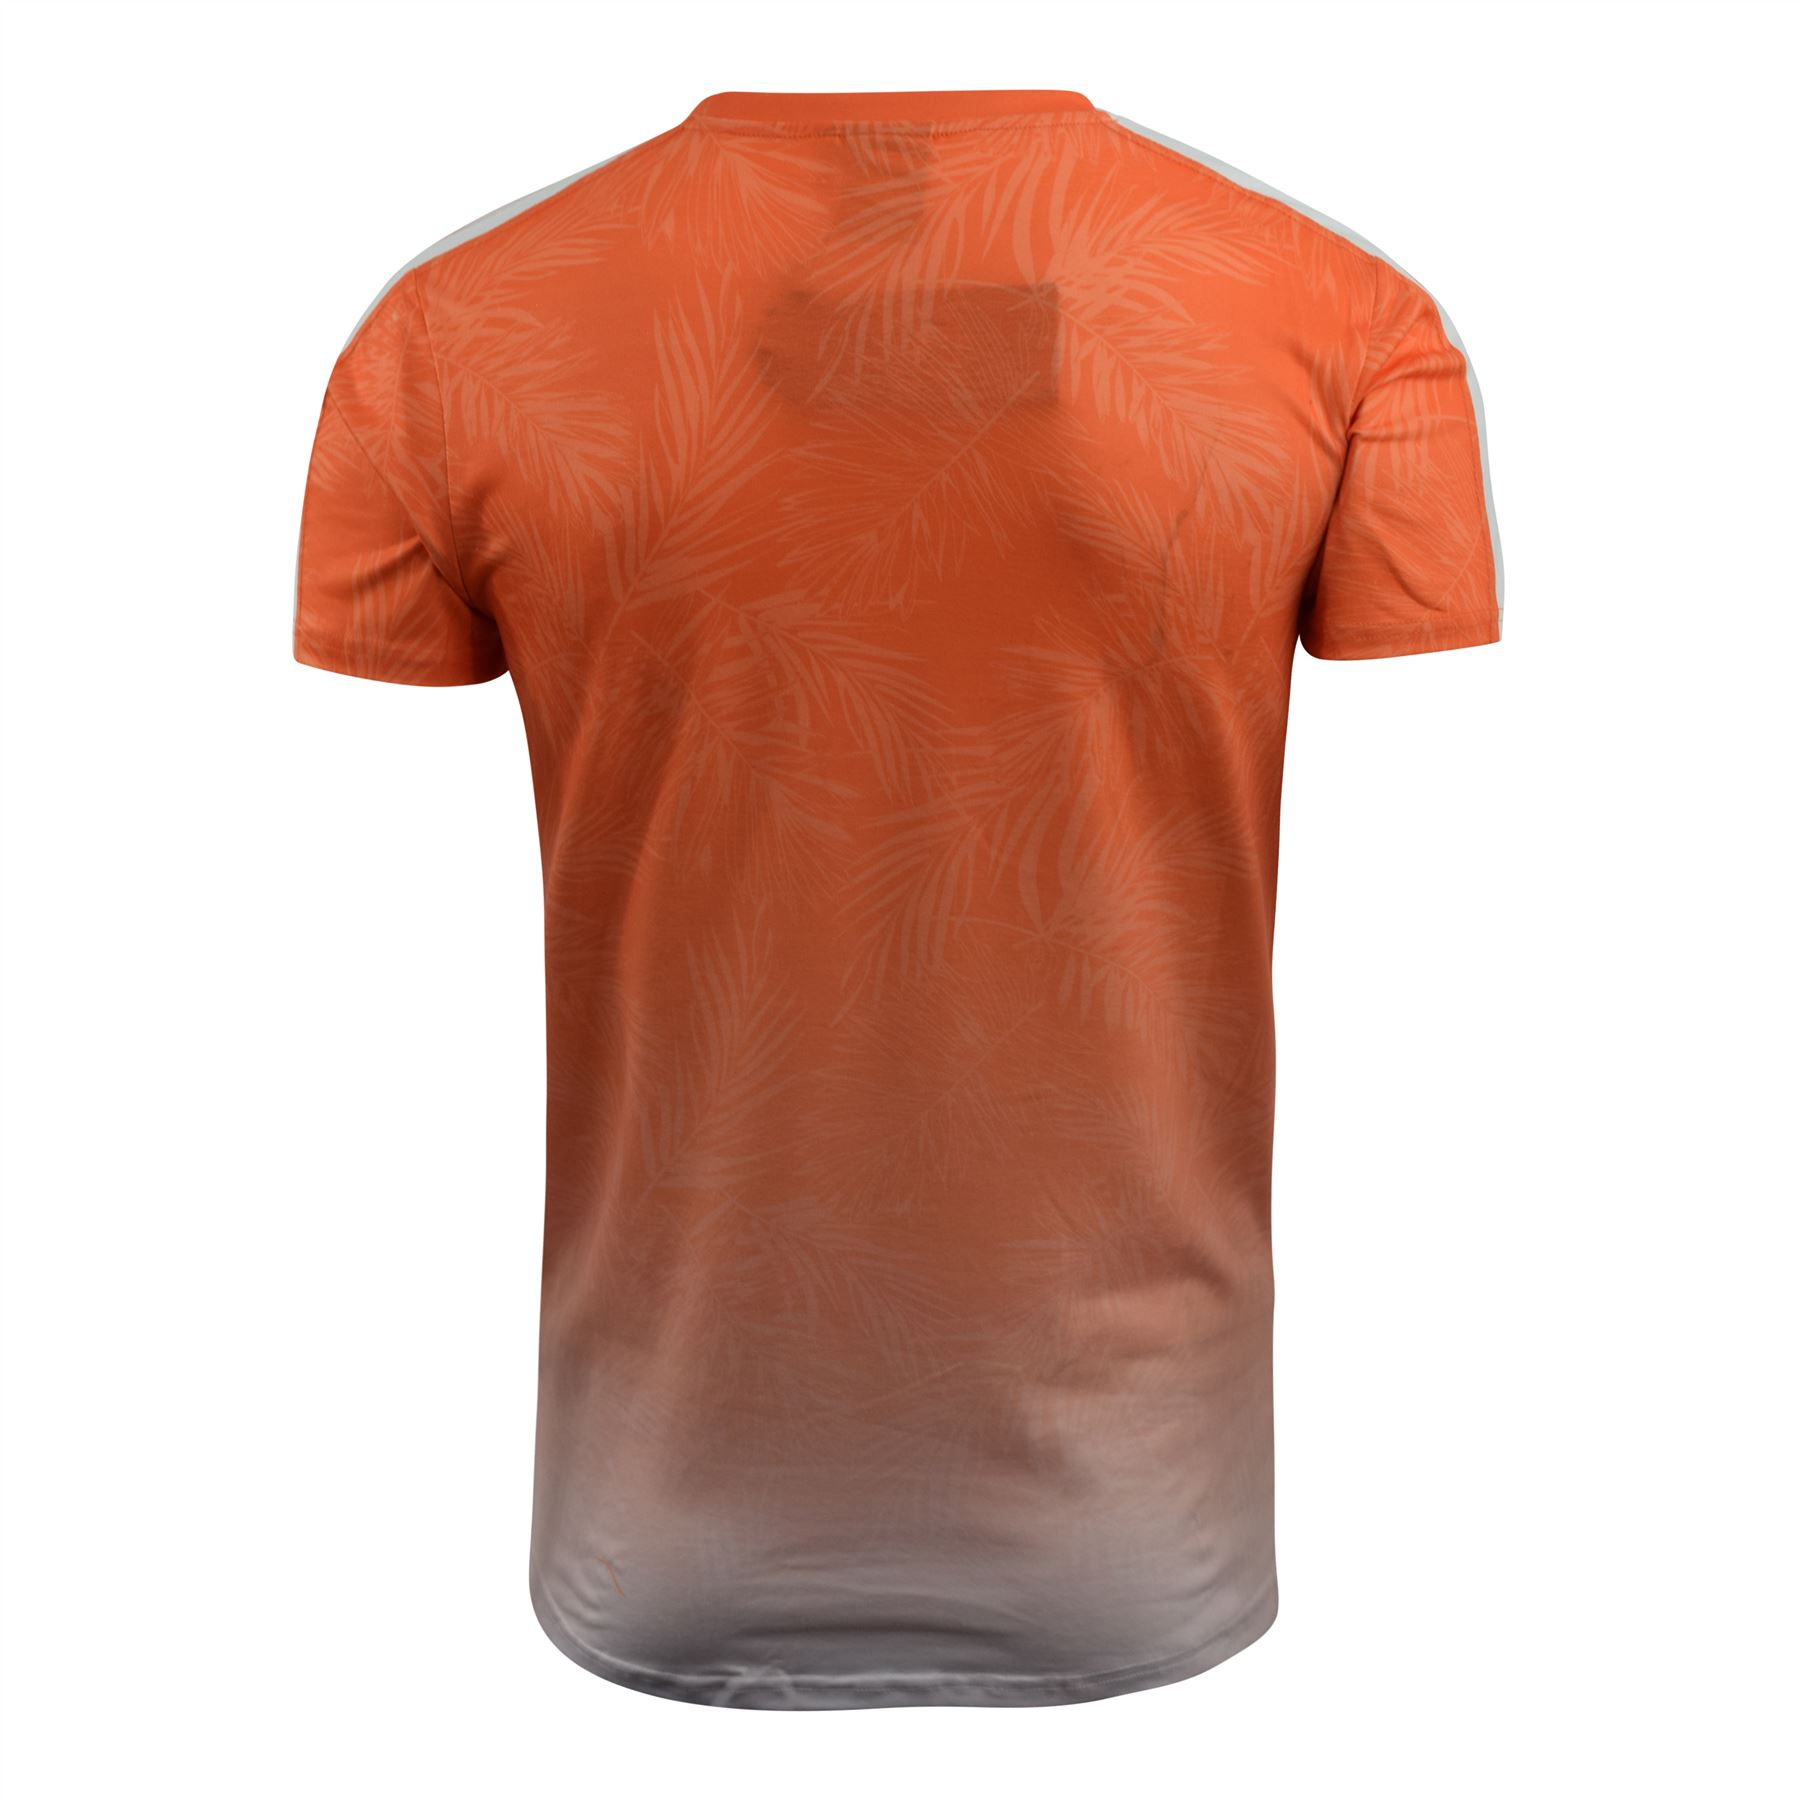 Mens-Crosshatch-T-Shirt-Contrast-Short-Sleeve-Tee-Top-Salifornia thumbnail 10